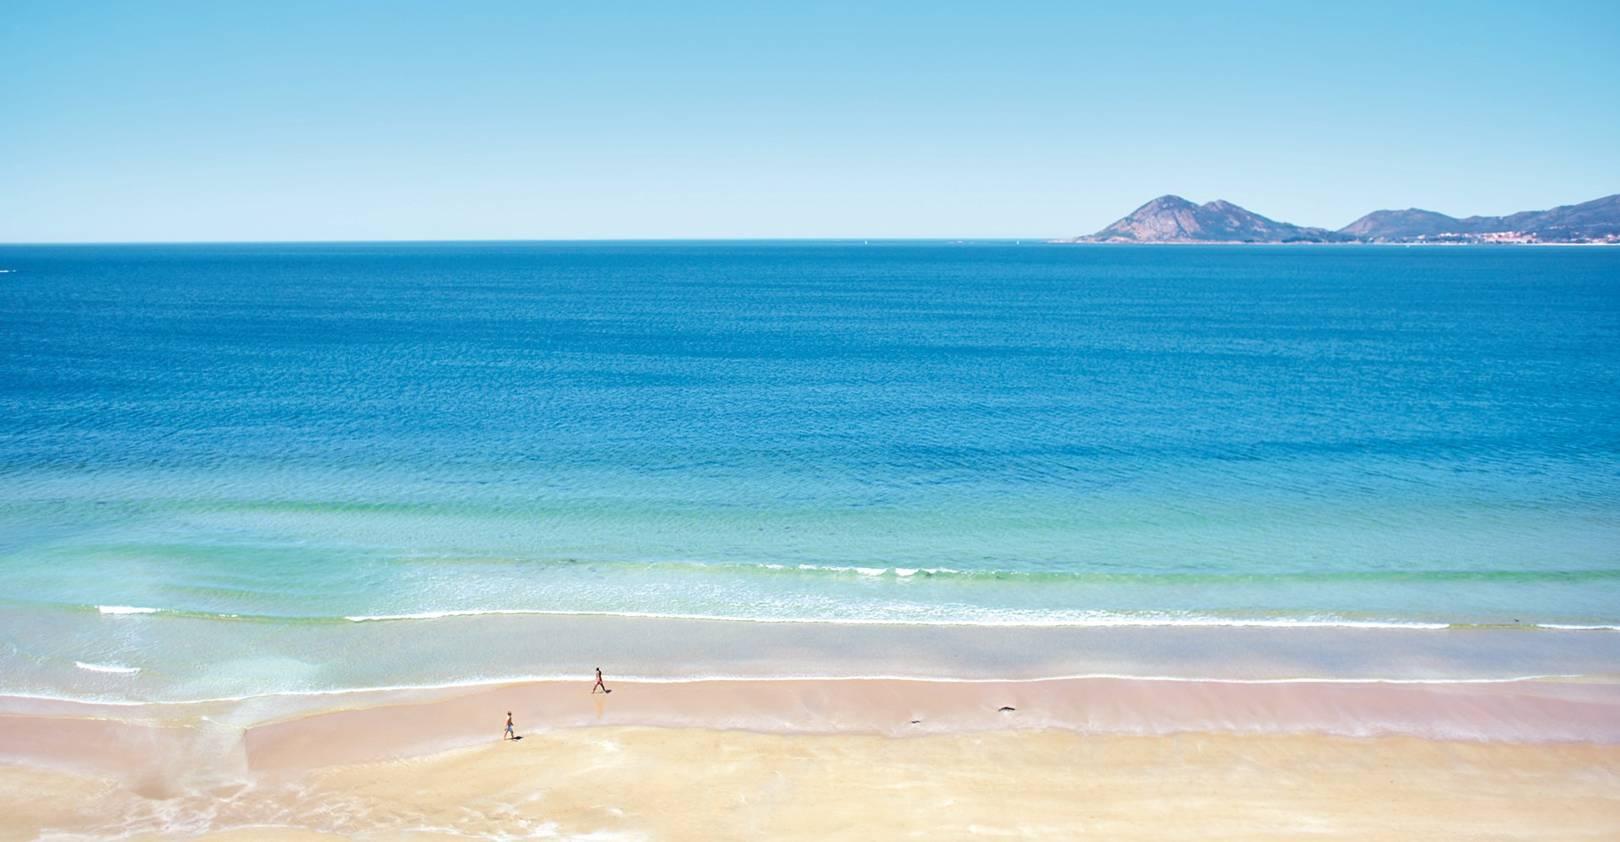 Galicia - Spain's golden coast